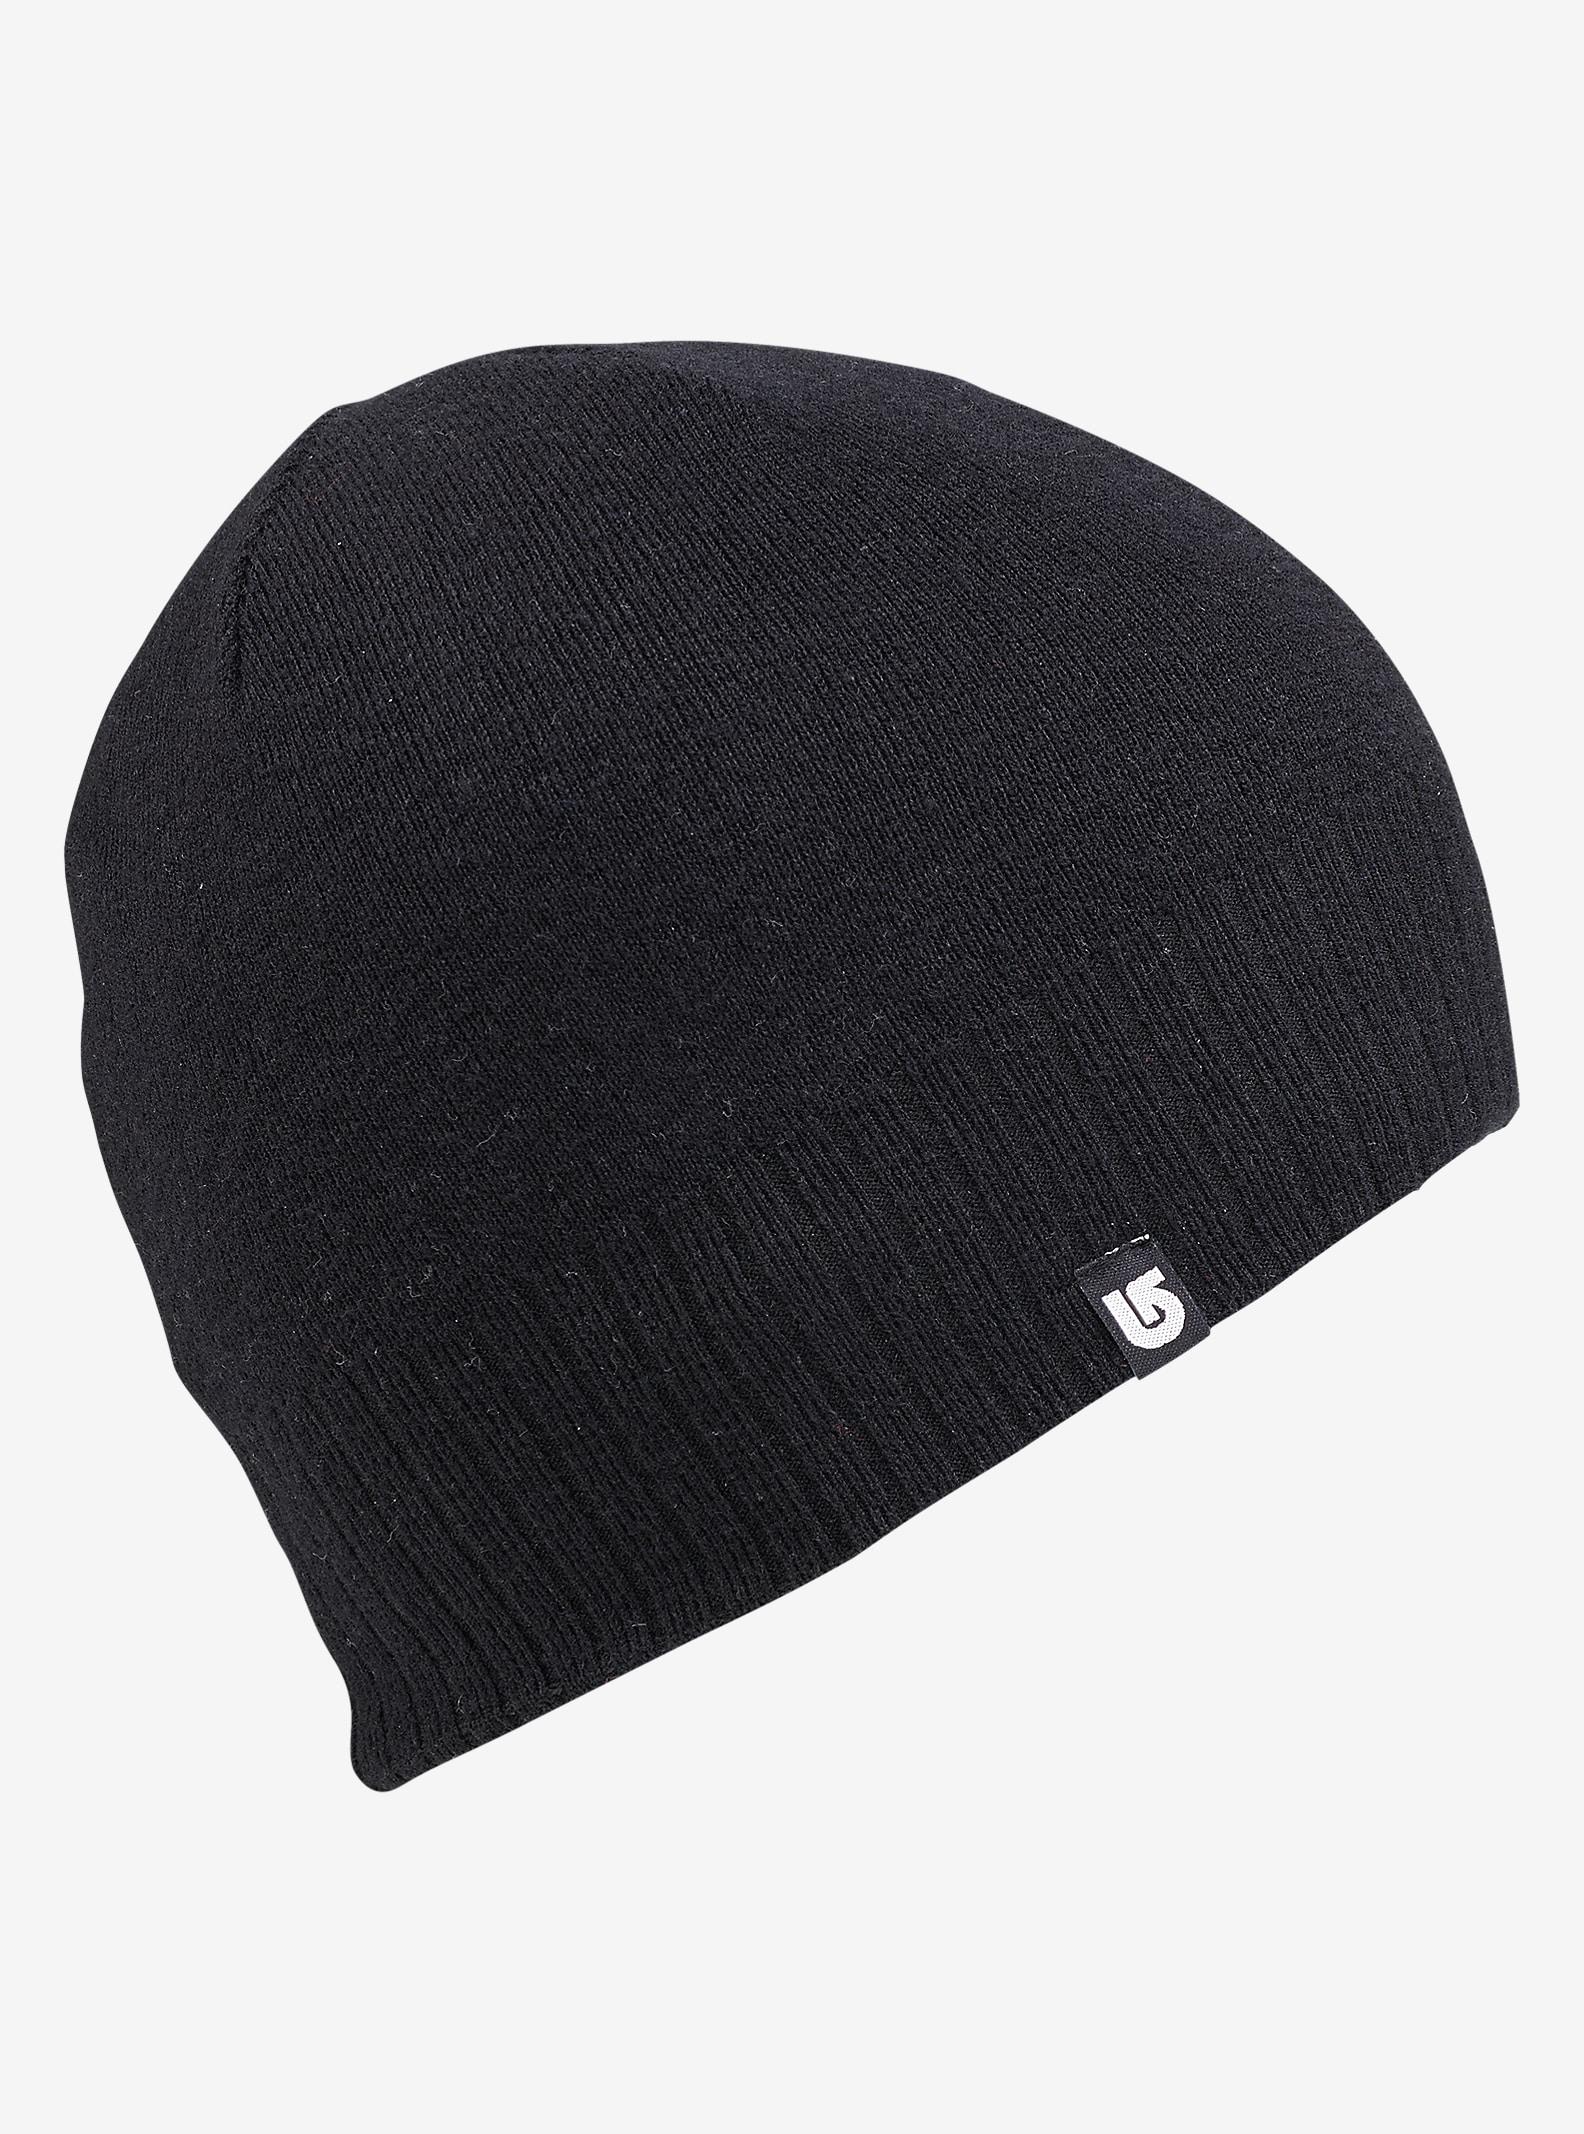 Burton Wool Liner Beanie - Reversible shown in True Black